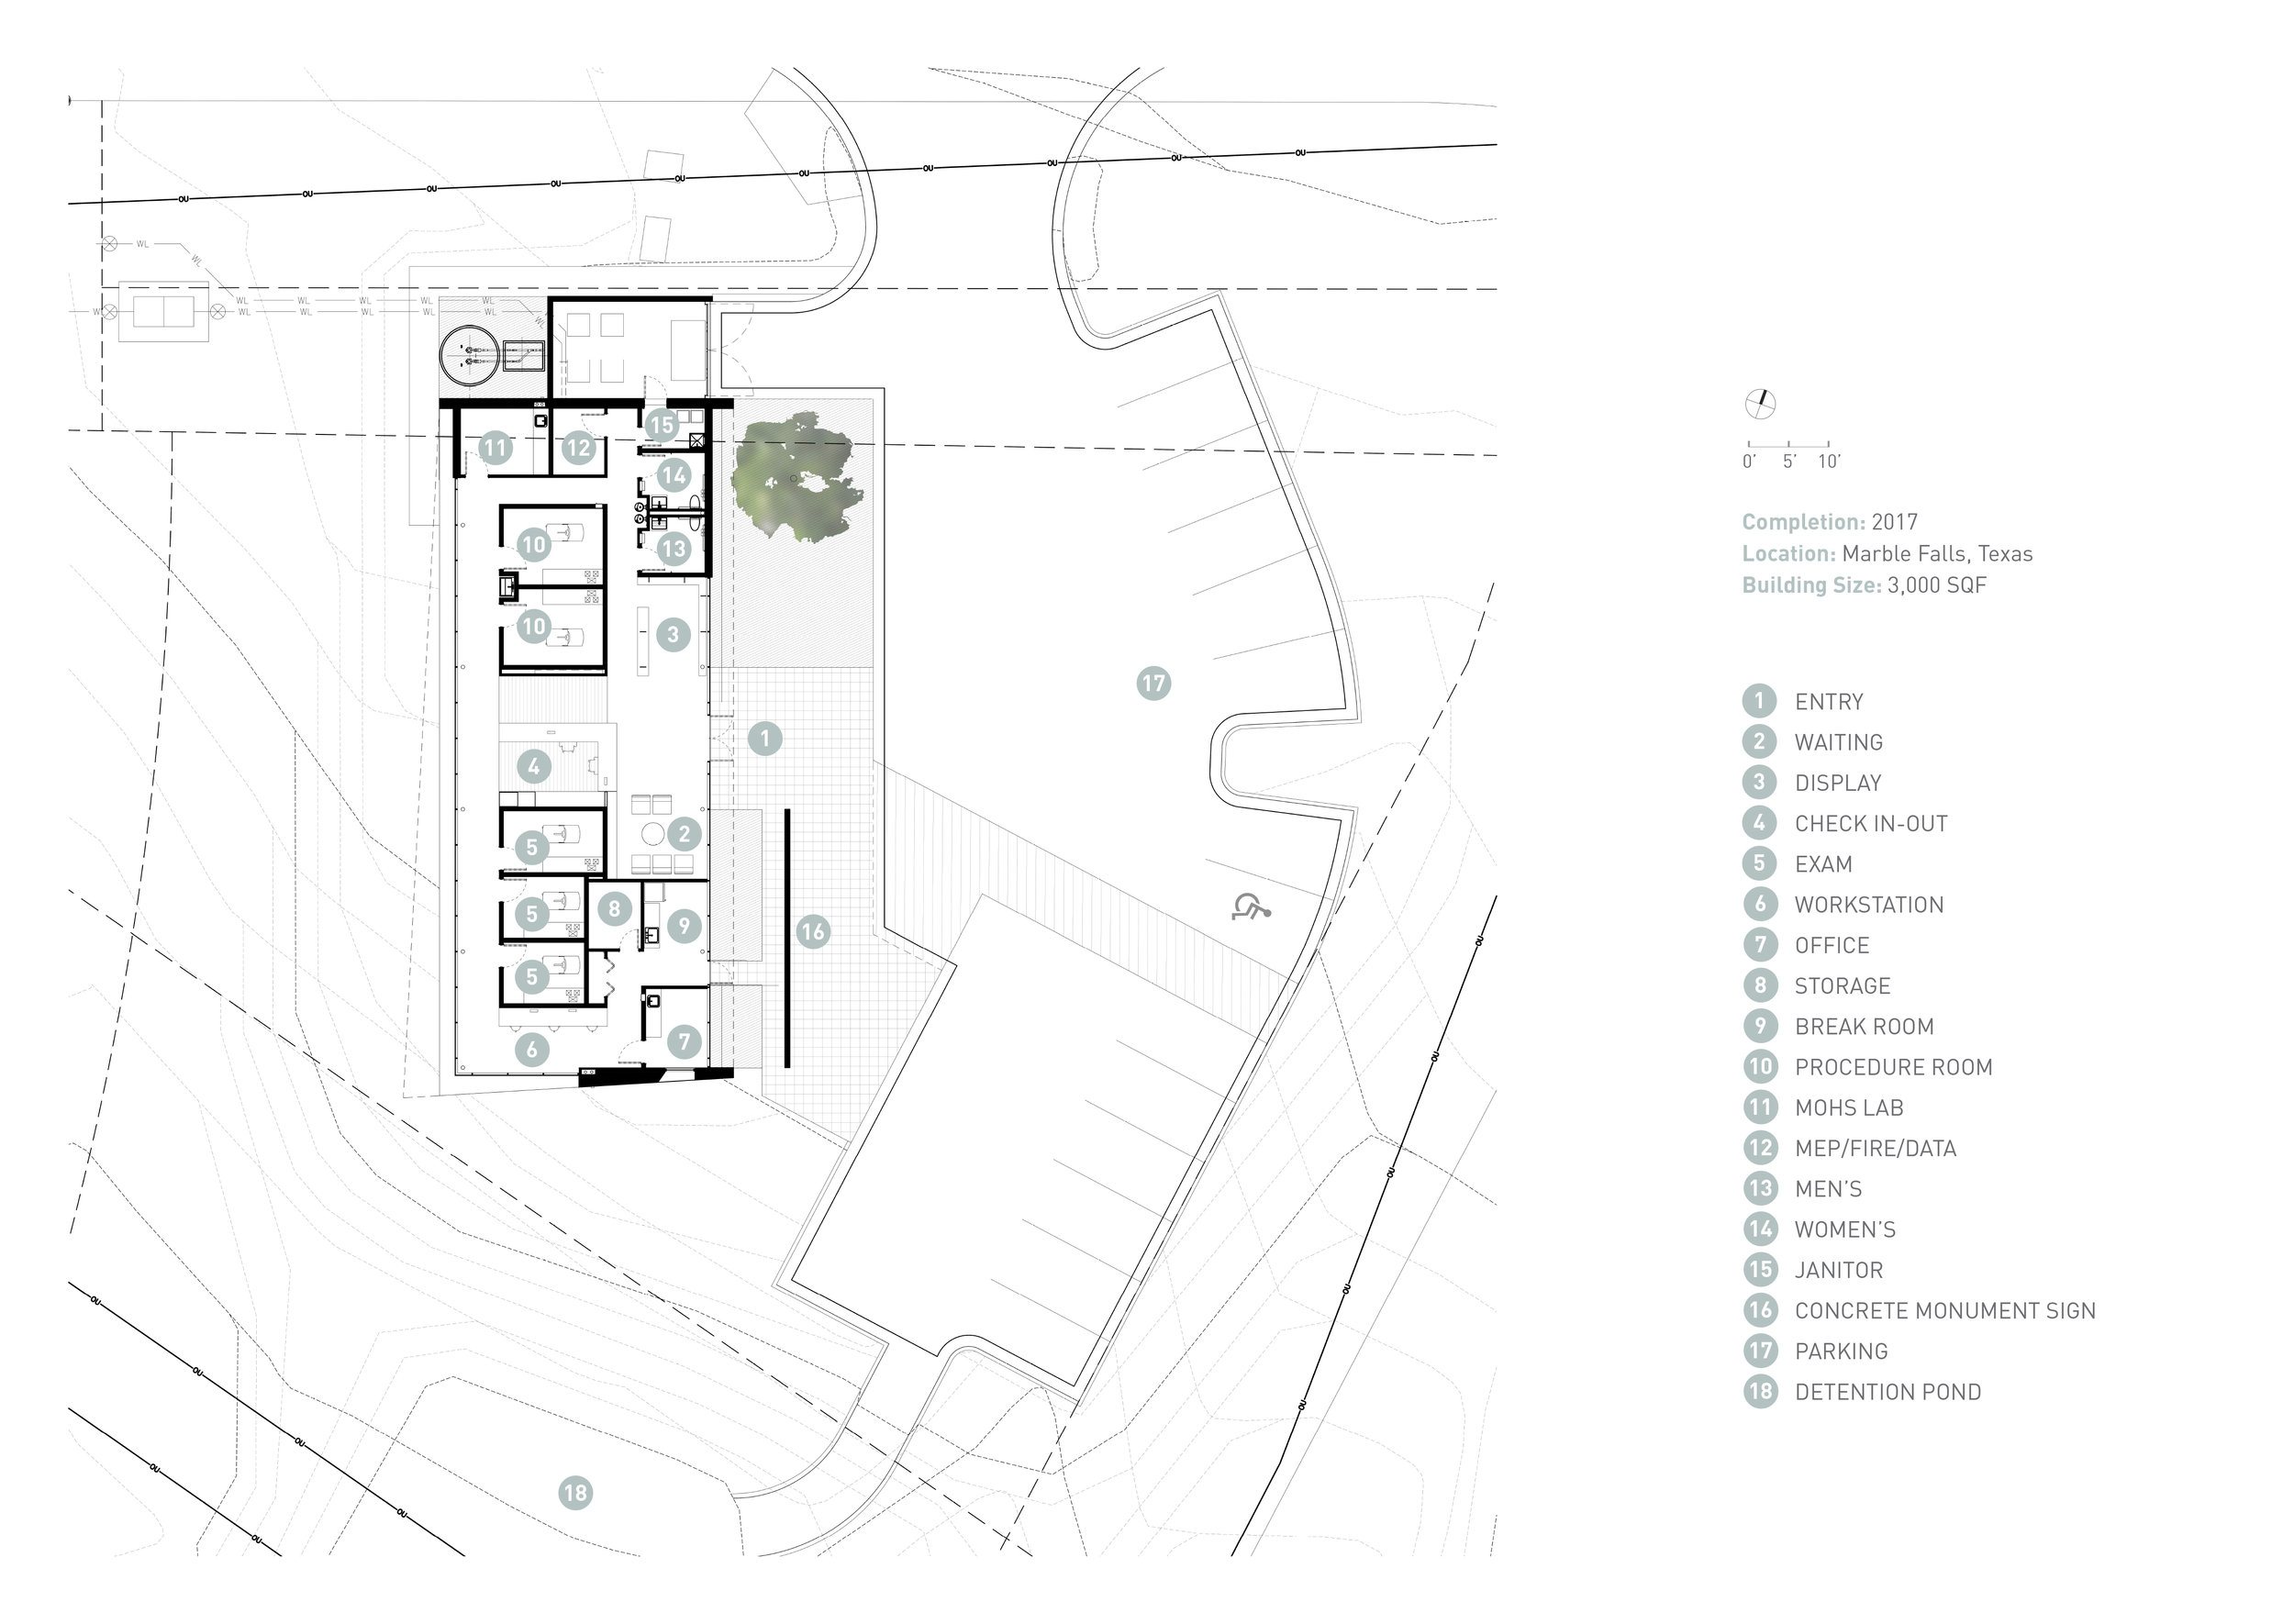 19 Westlake Dermatology Marble Falls by Matt Fajkus Architecture_Graphic plan.jpg